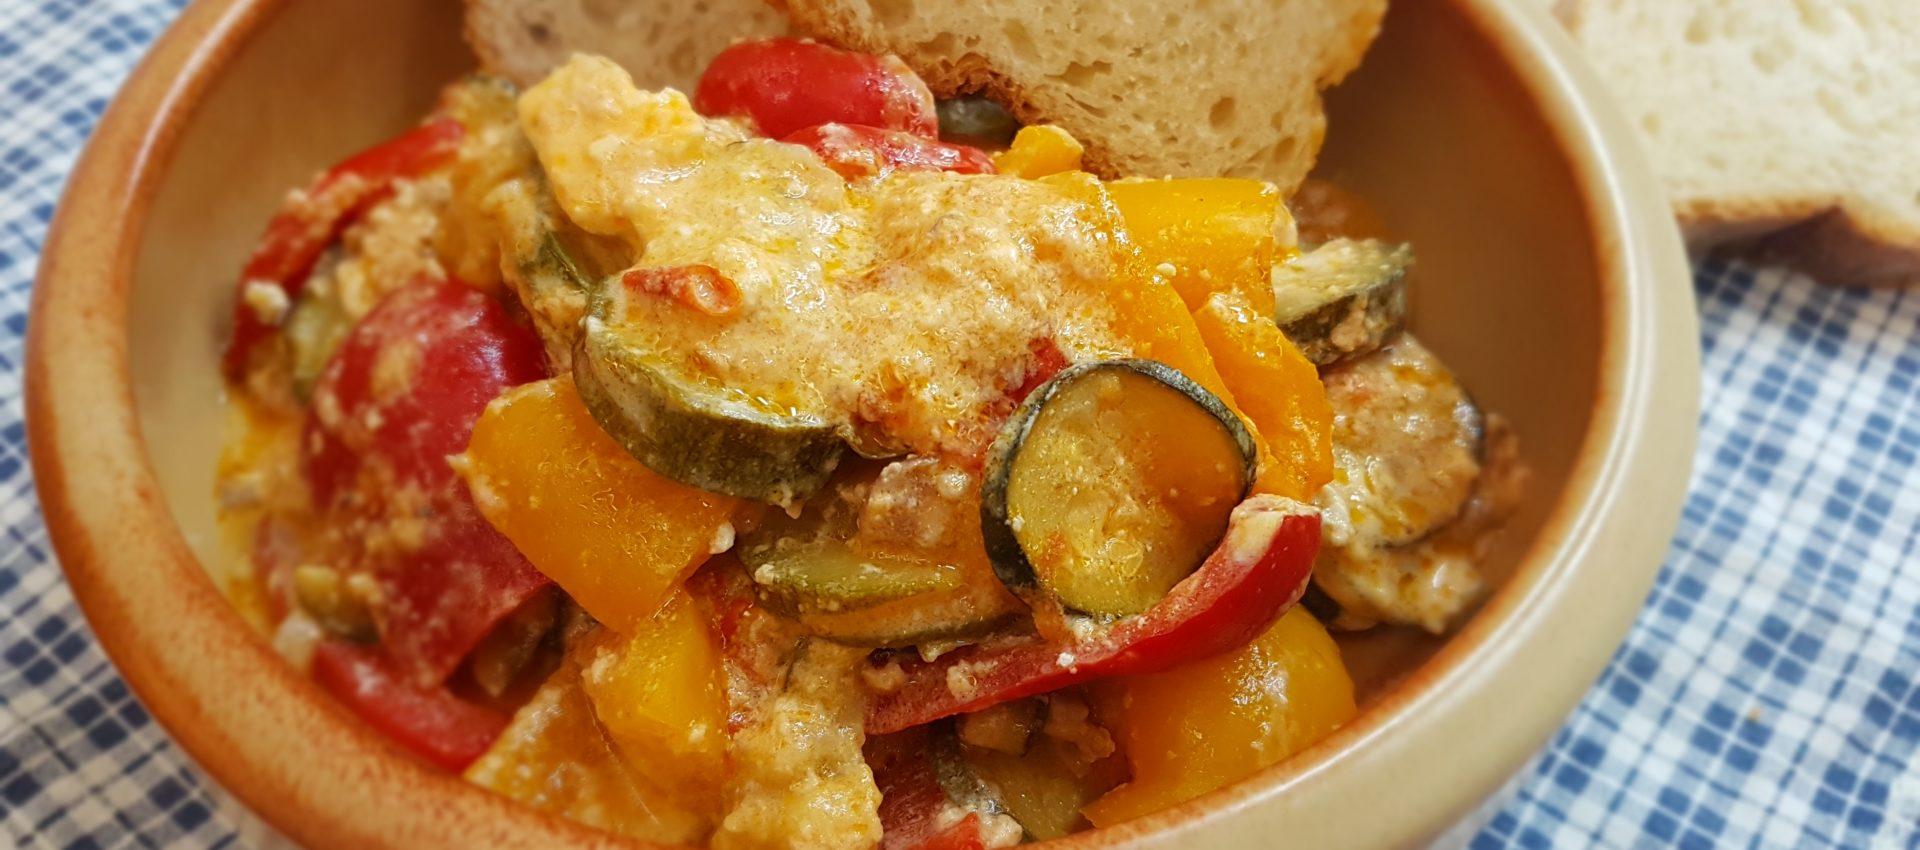 verdure con formaggi